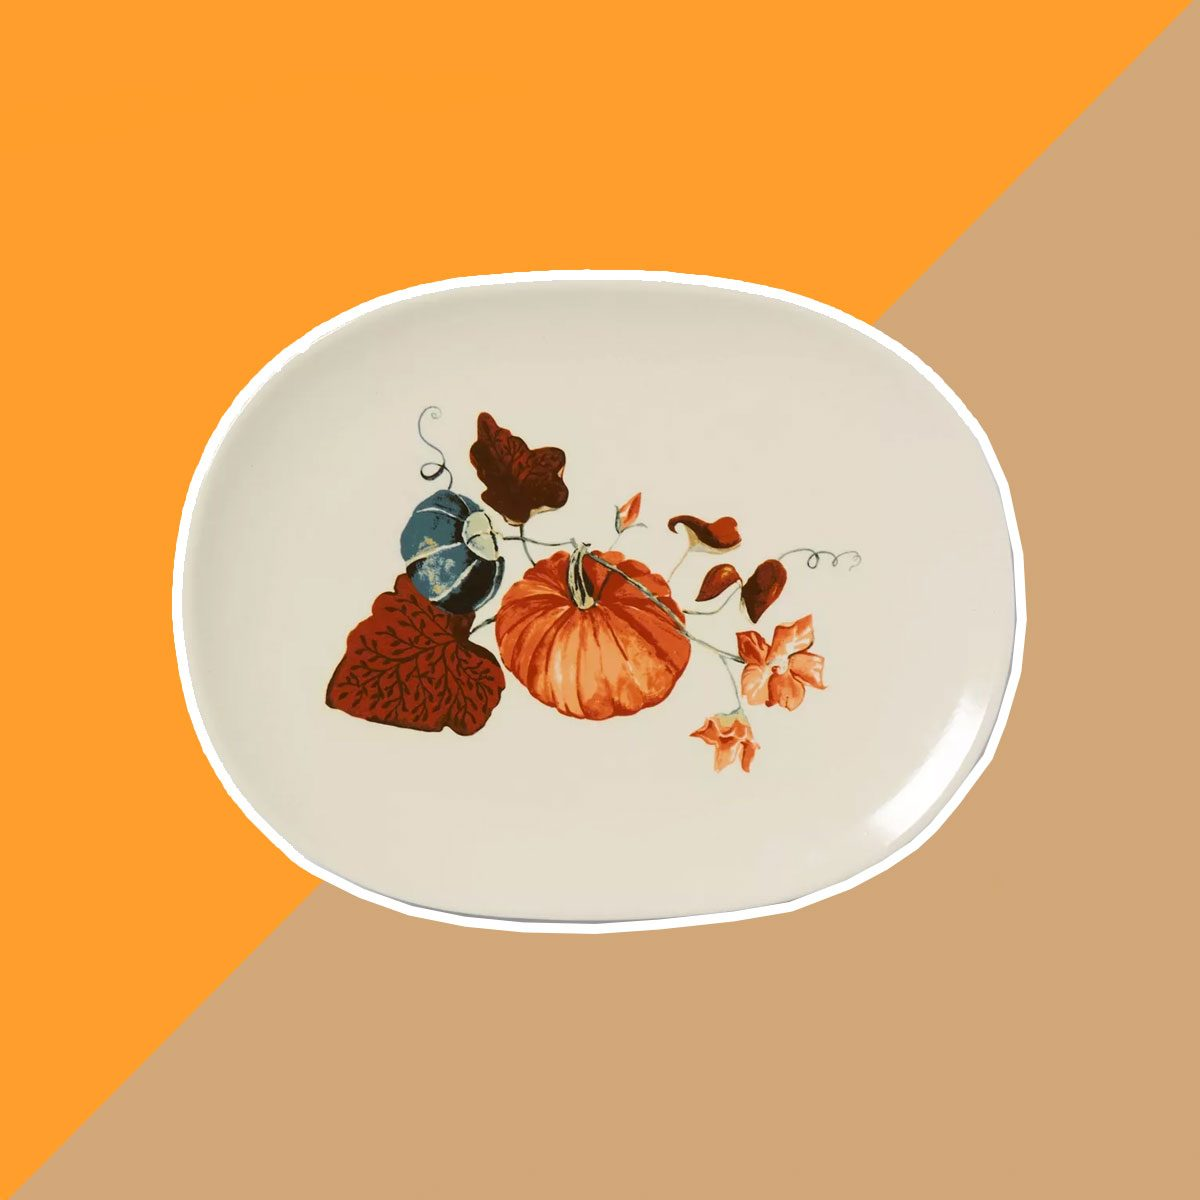 "15"" x 11"" Stoneware Decal Serving Platter White - Threshold™"